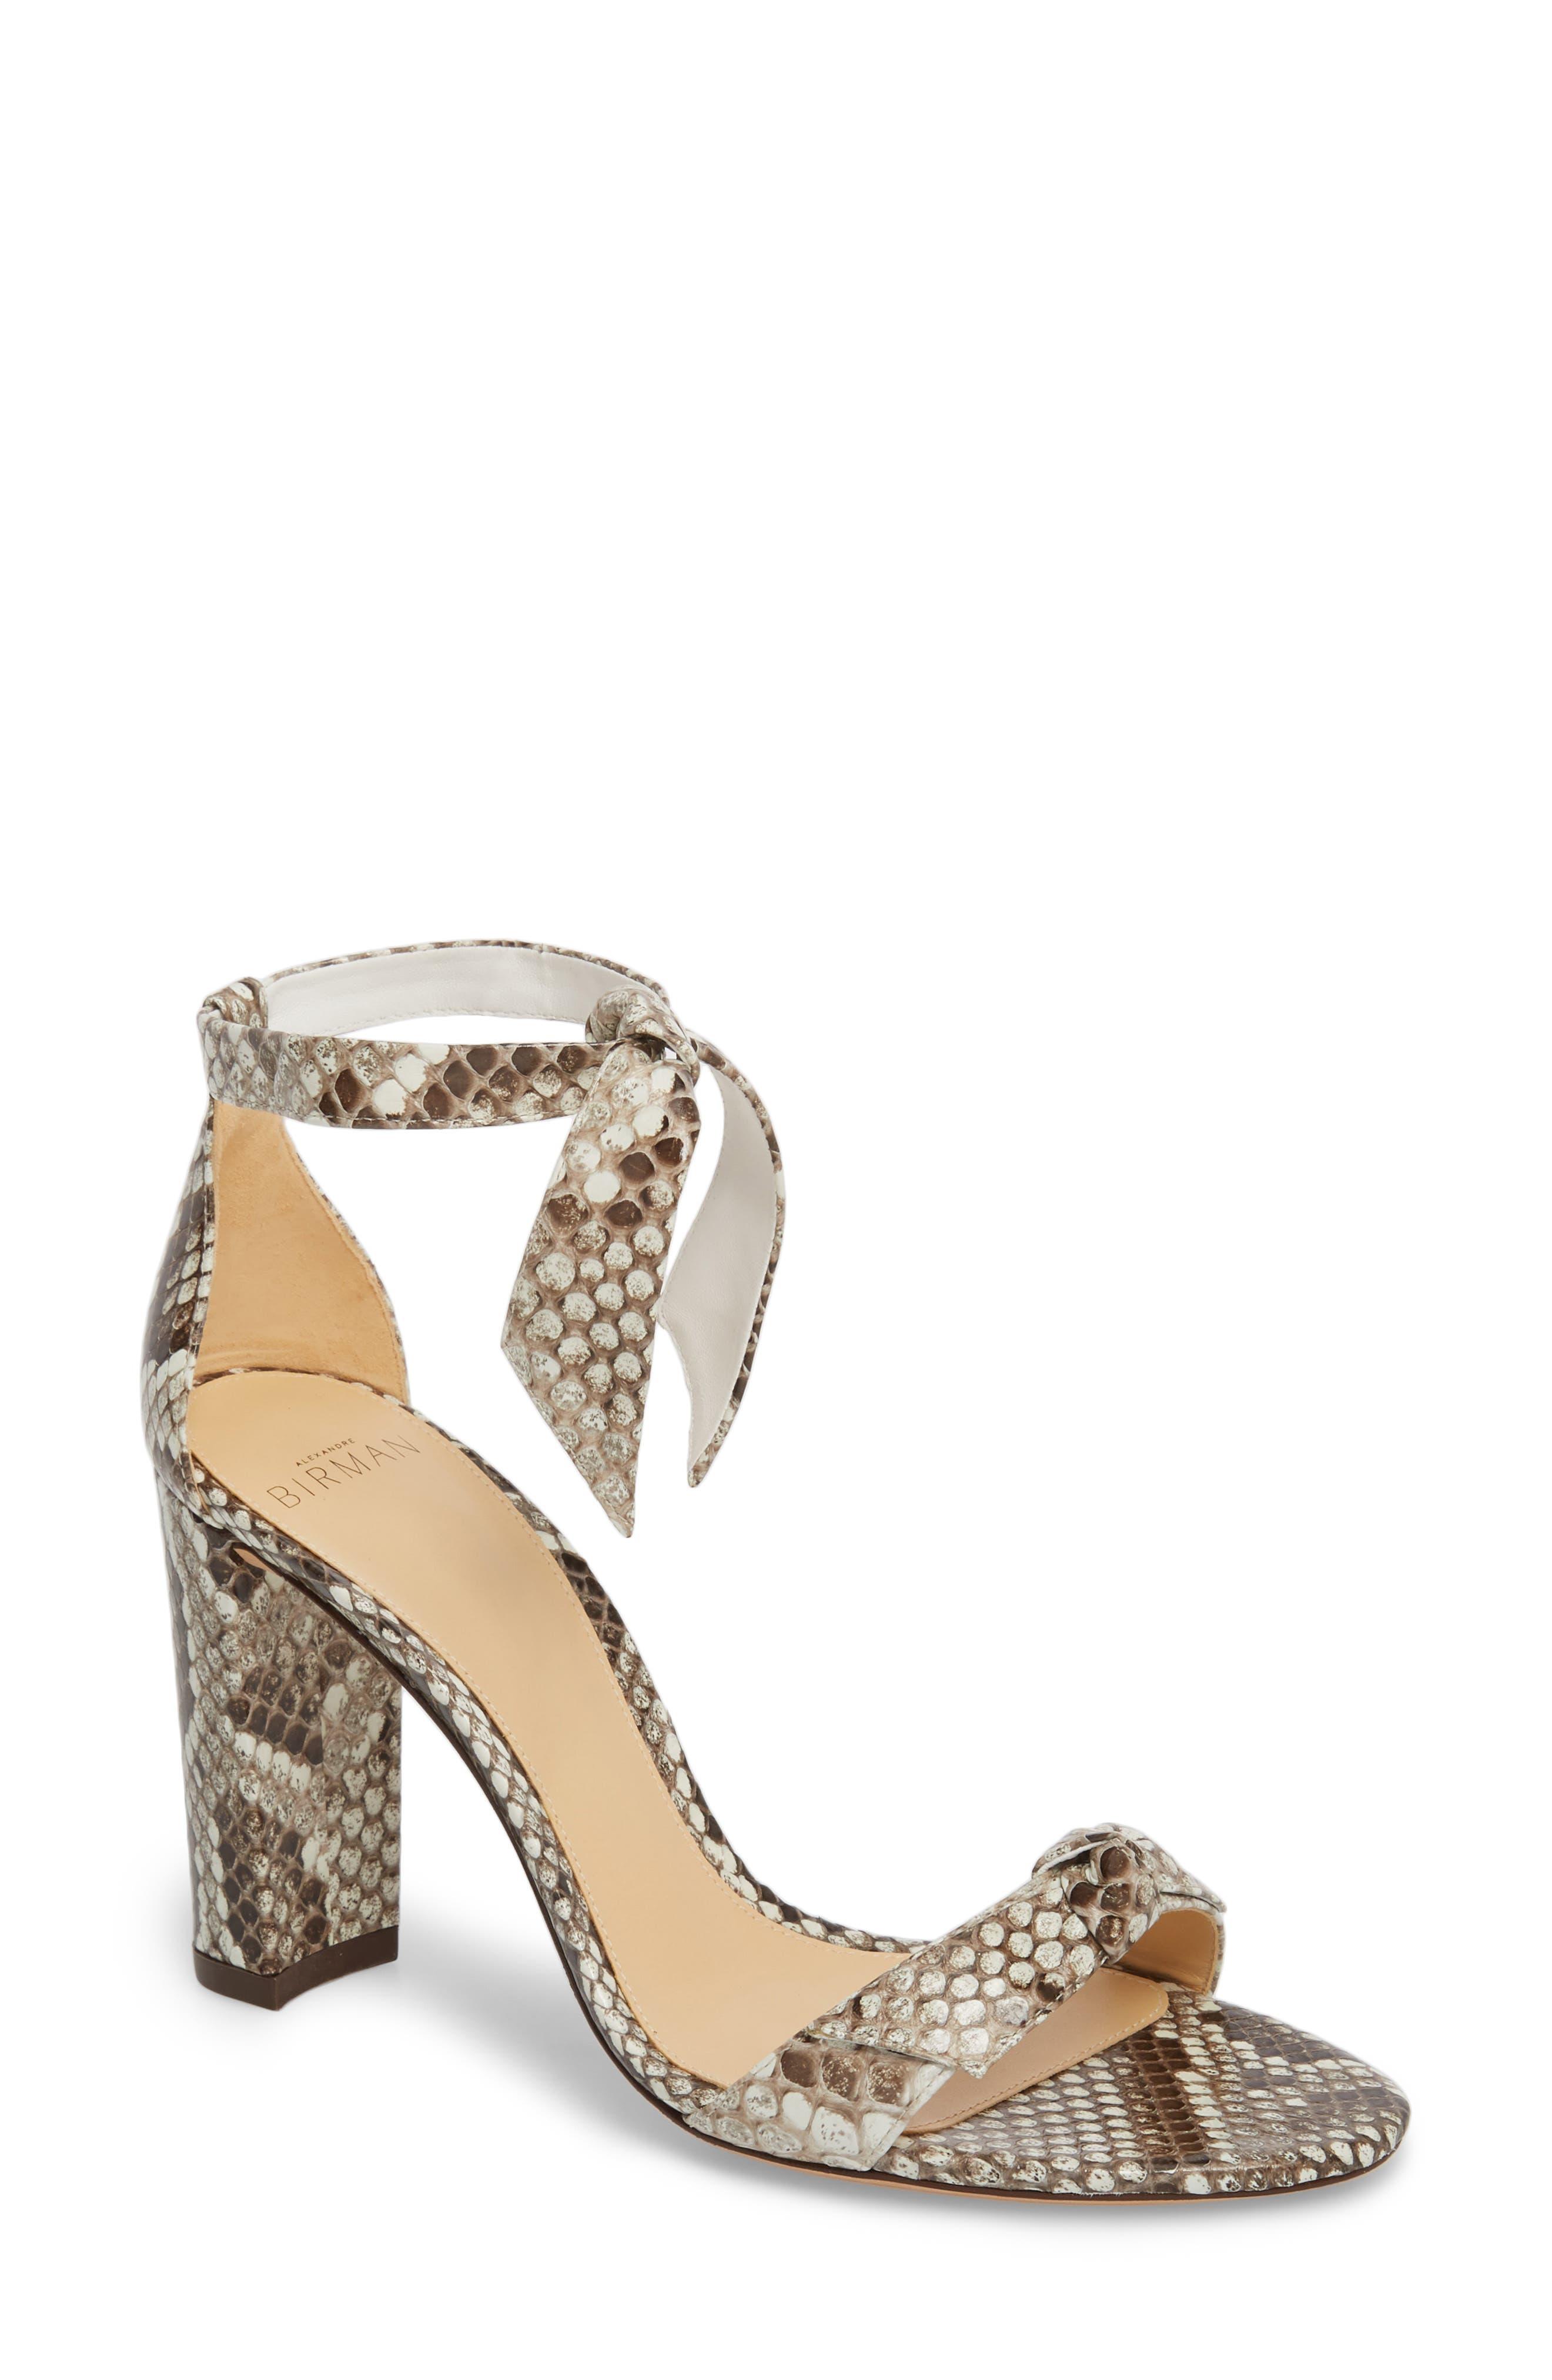 Clarita Genuine Python Ankle Tie Sandal,                             Main thumbnail 1, color,                             Natural